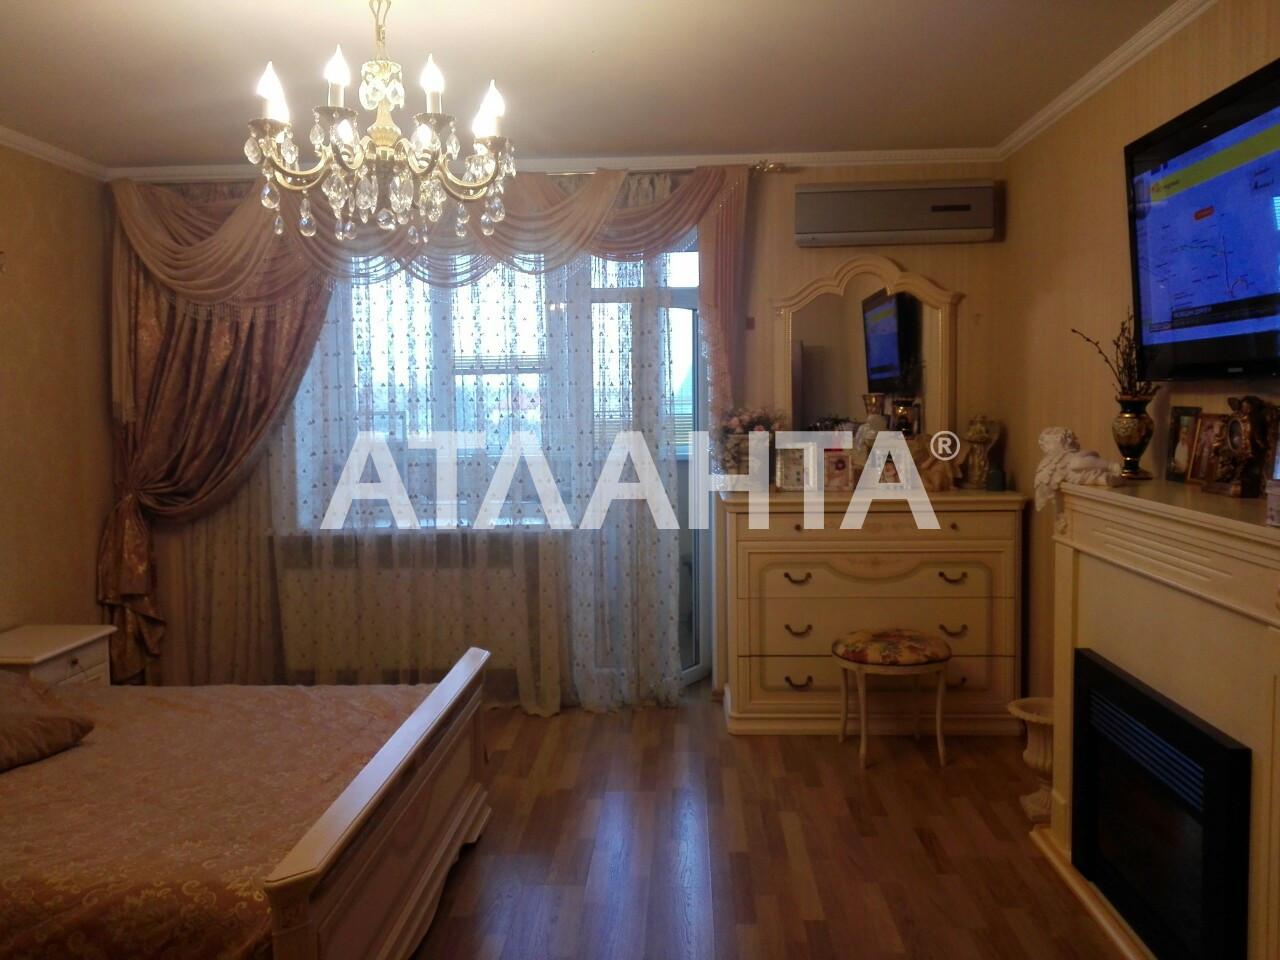 Продается 3-комнатная Квартира на ул. Бабаджаняна Марш. (Рекордная) — 100 000 у.е. (фото №3)